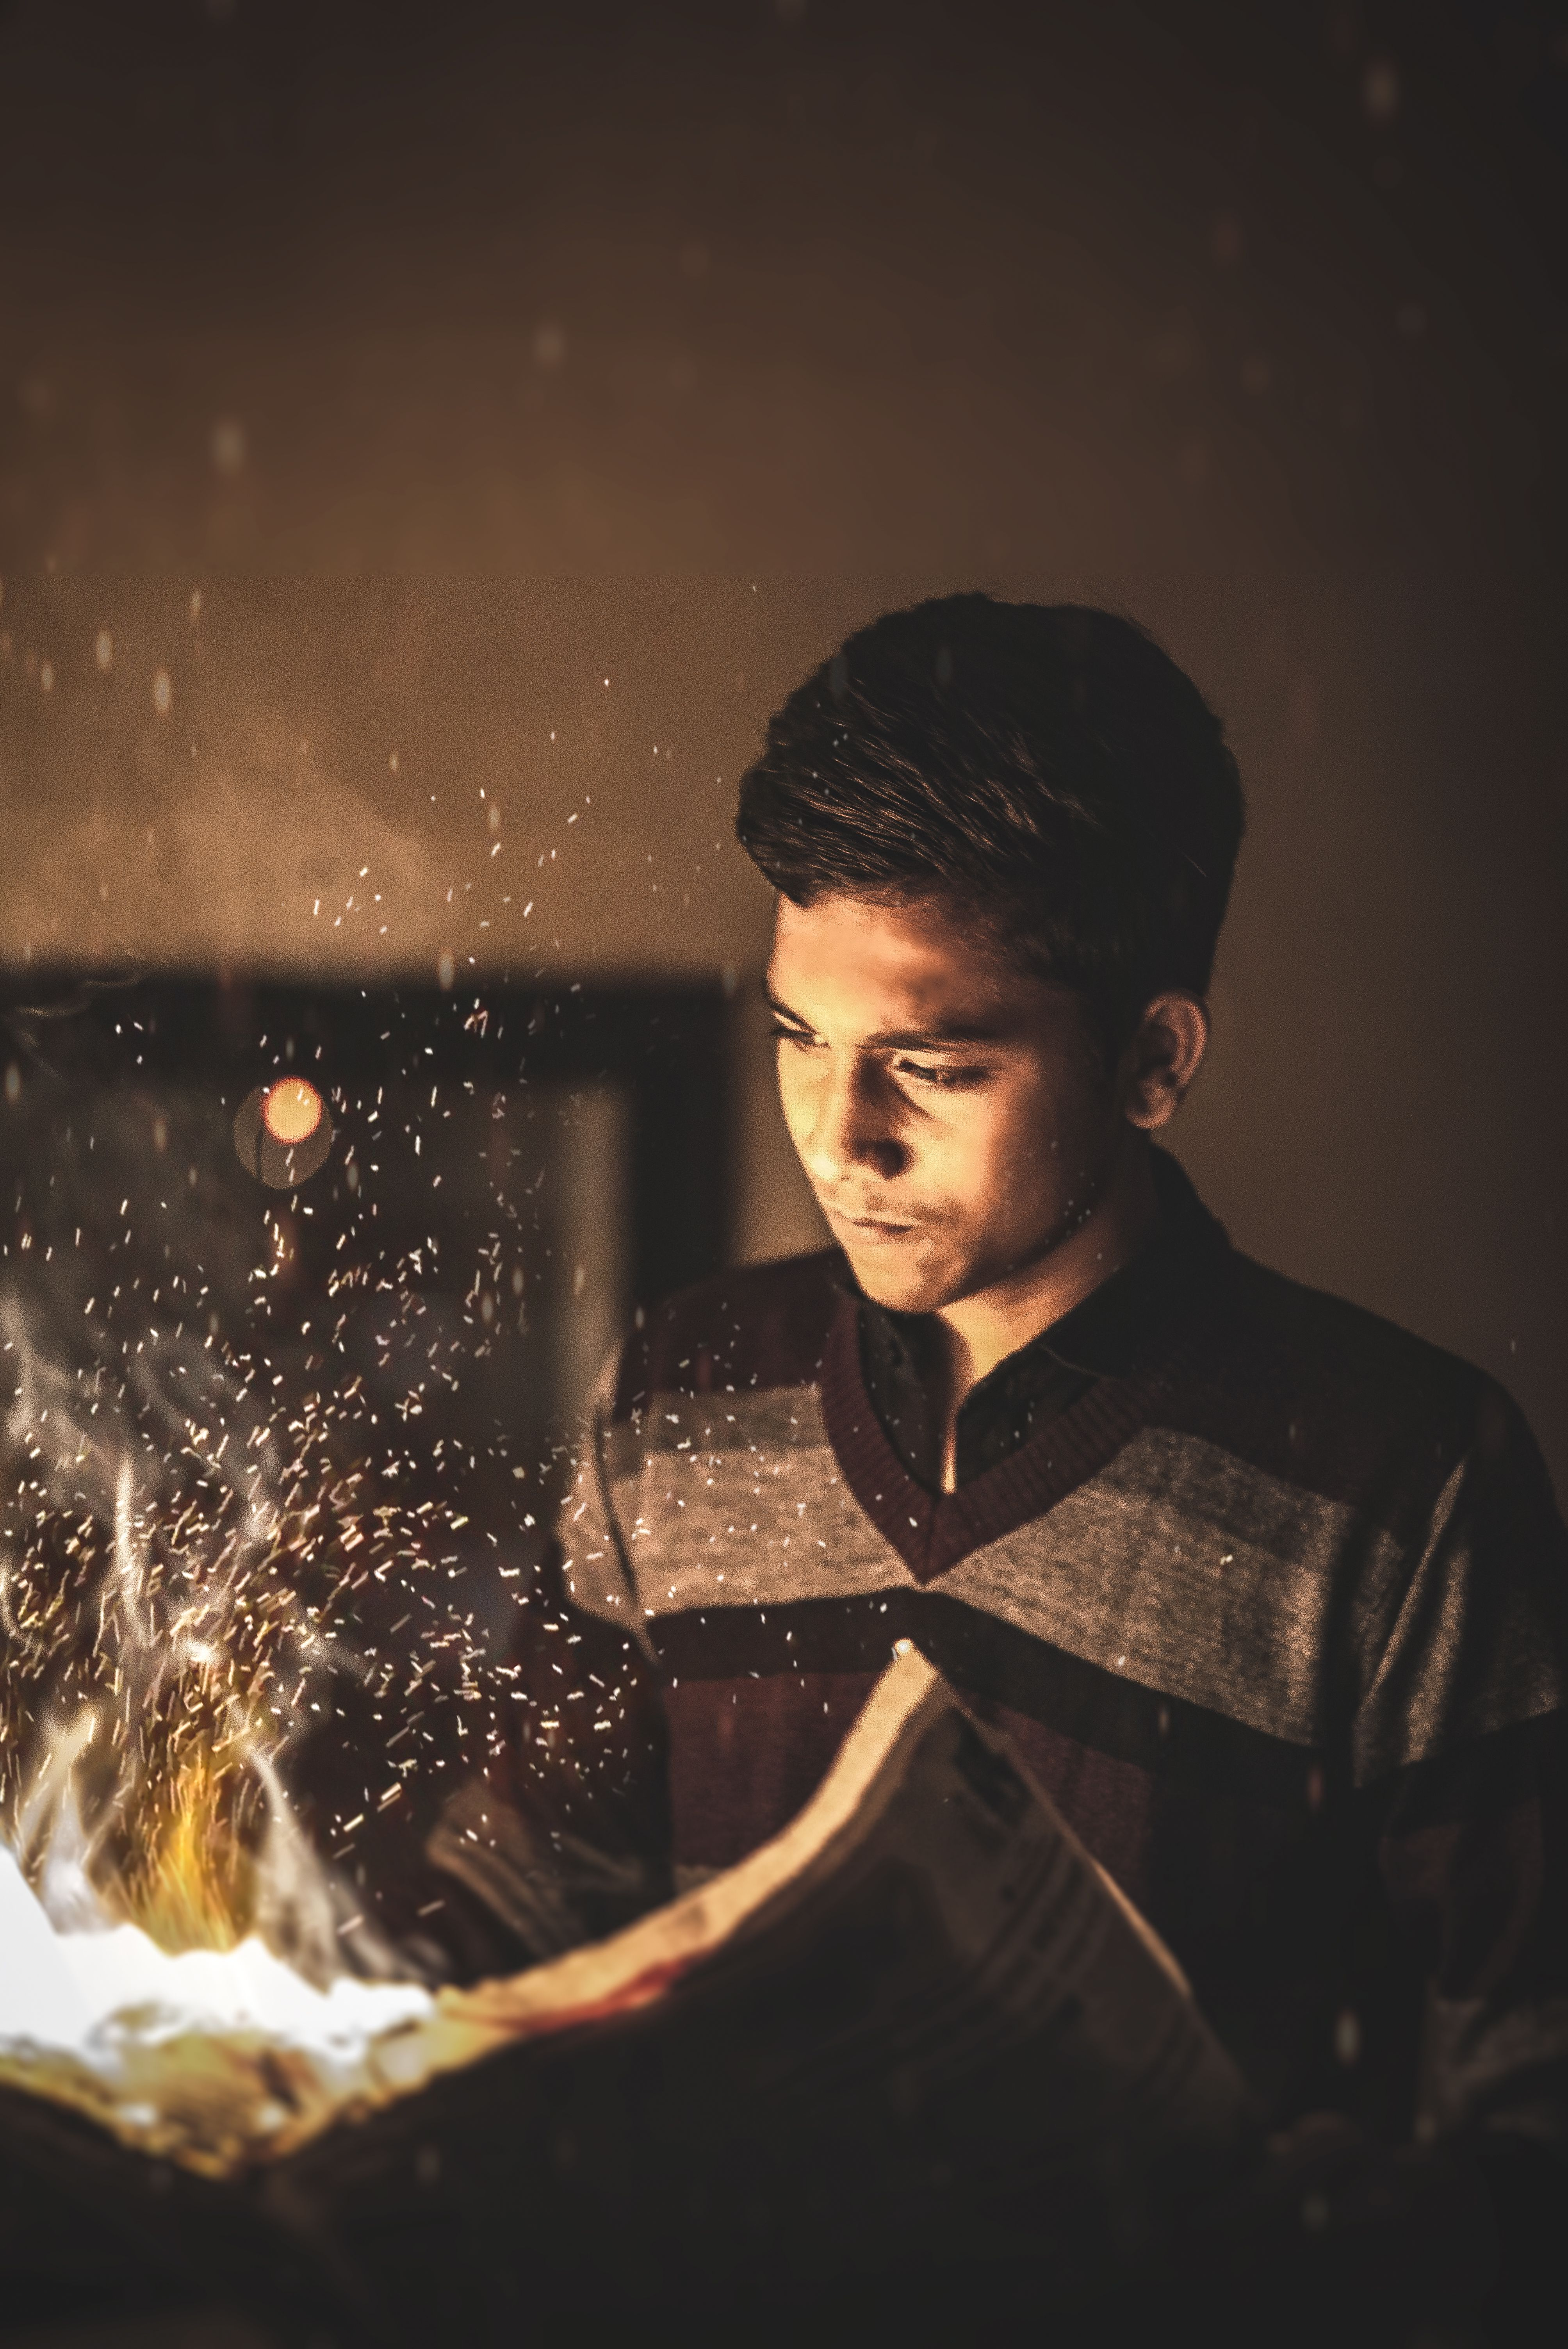 Paper Fire Portrait Photography Fashion Fade Guys Creative Newspaper Imagine Photoediting Portrait Portrait Photography Instagram Inspiration